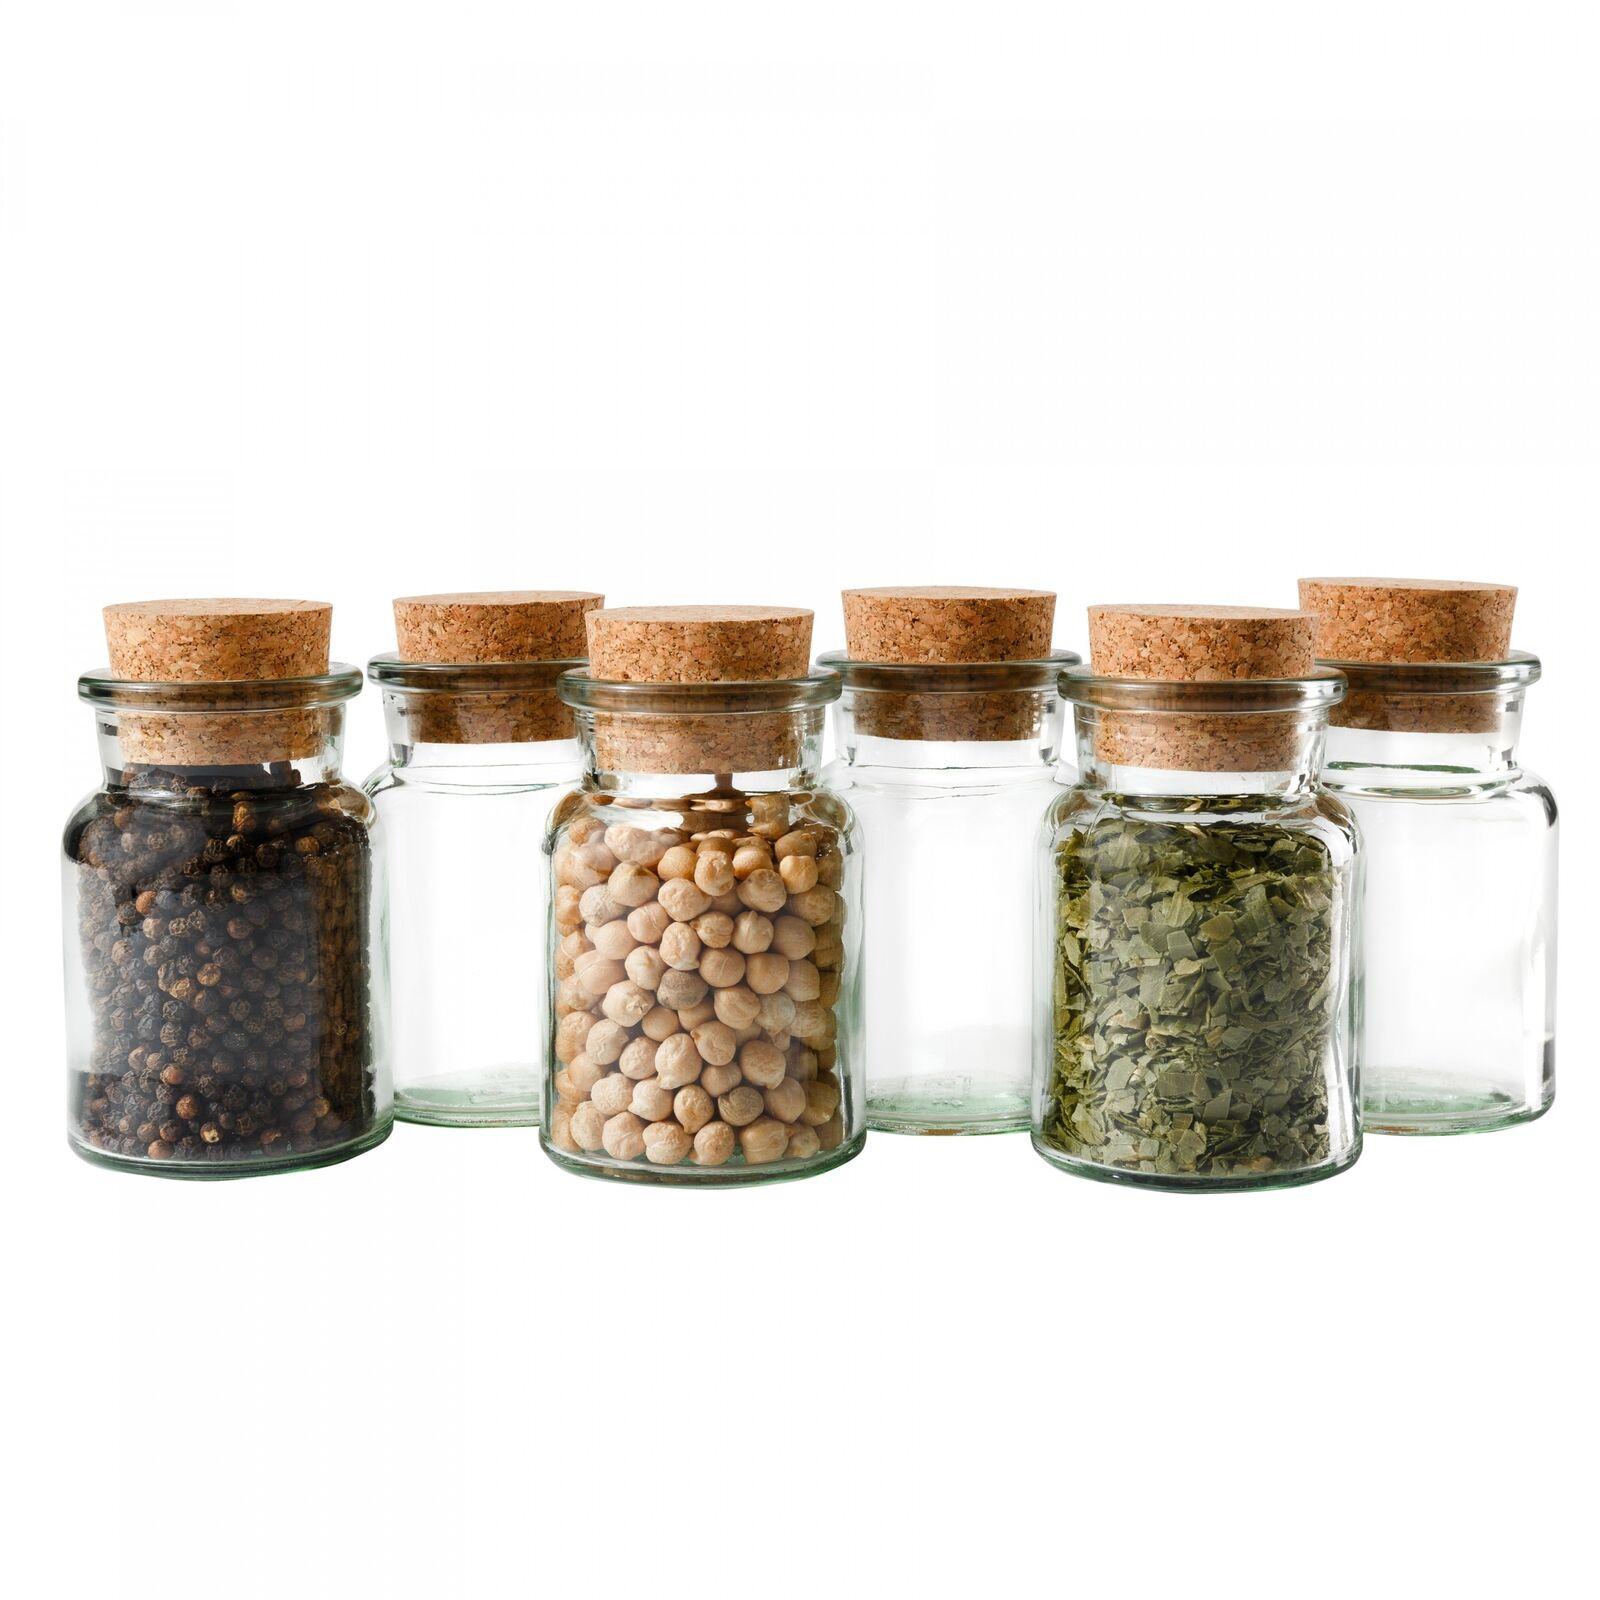 6 Gewürzgläser 150ml + Korken, Tee Kräuter Gewürze Gewürzdose Korkenglas Glas